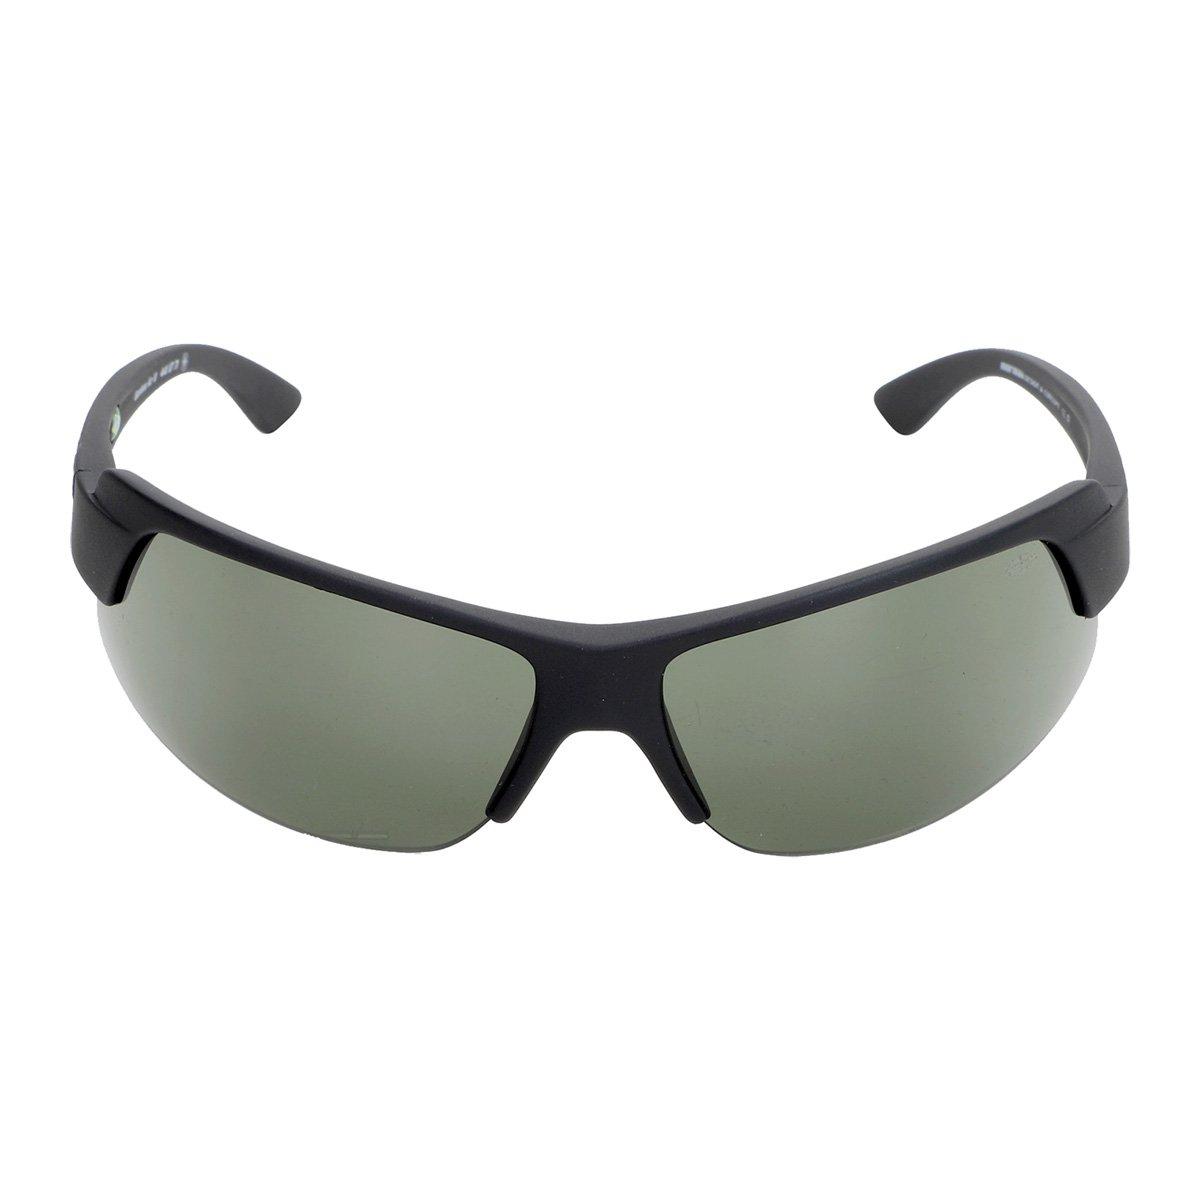 Óculos Mormaii Gamboa Air 3 - Preto - Compre Agora   Netshoes a9231660d0